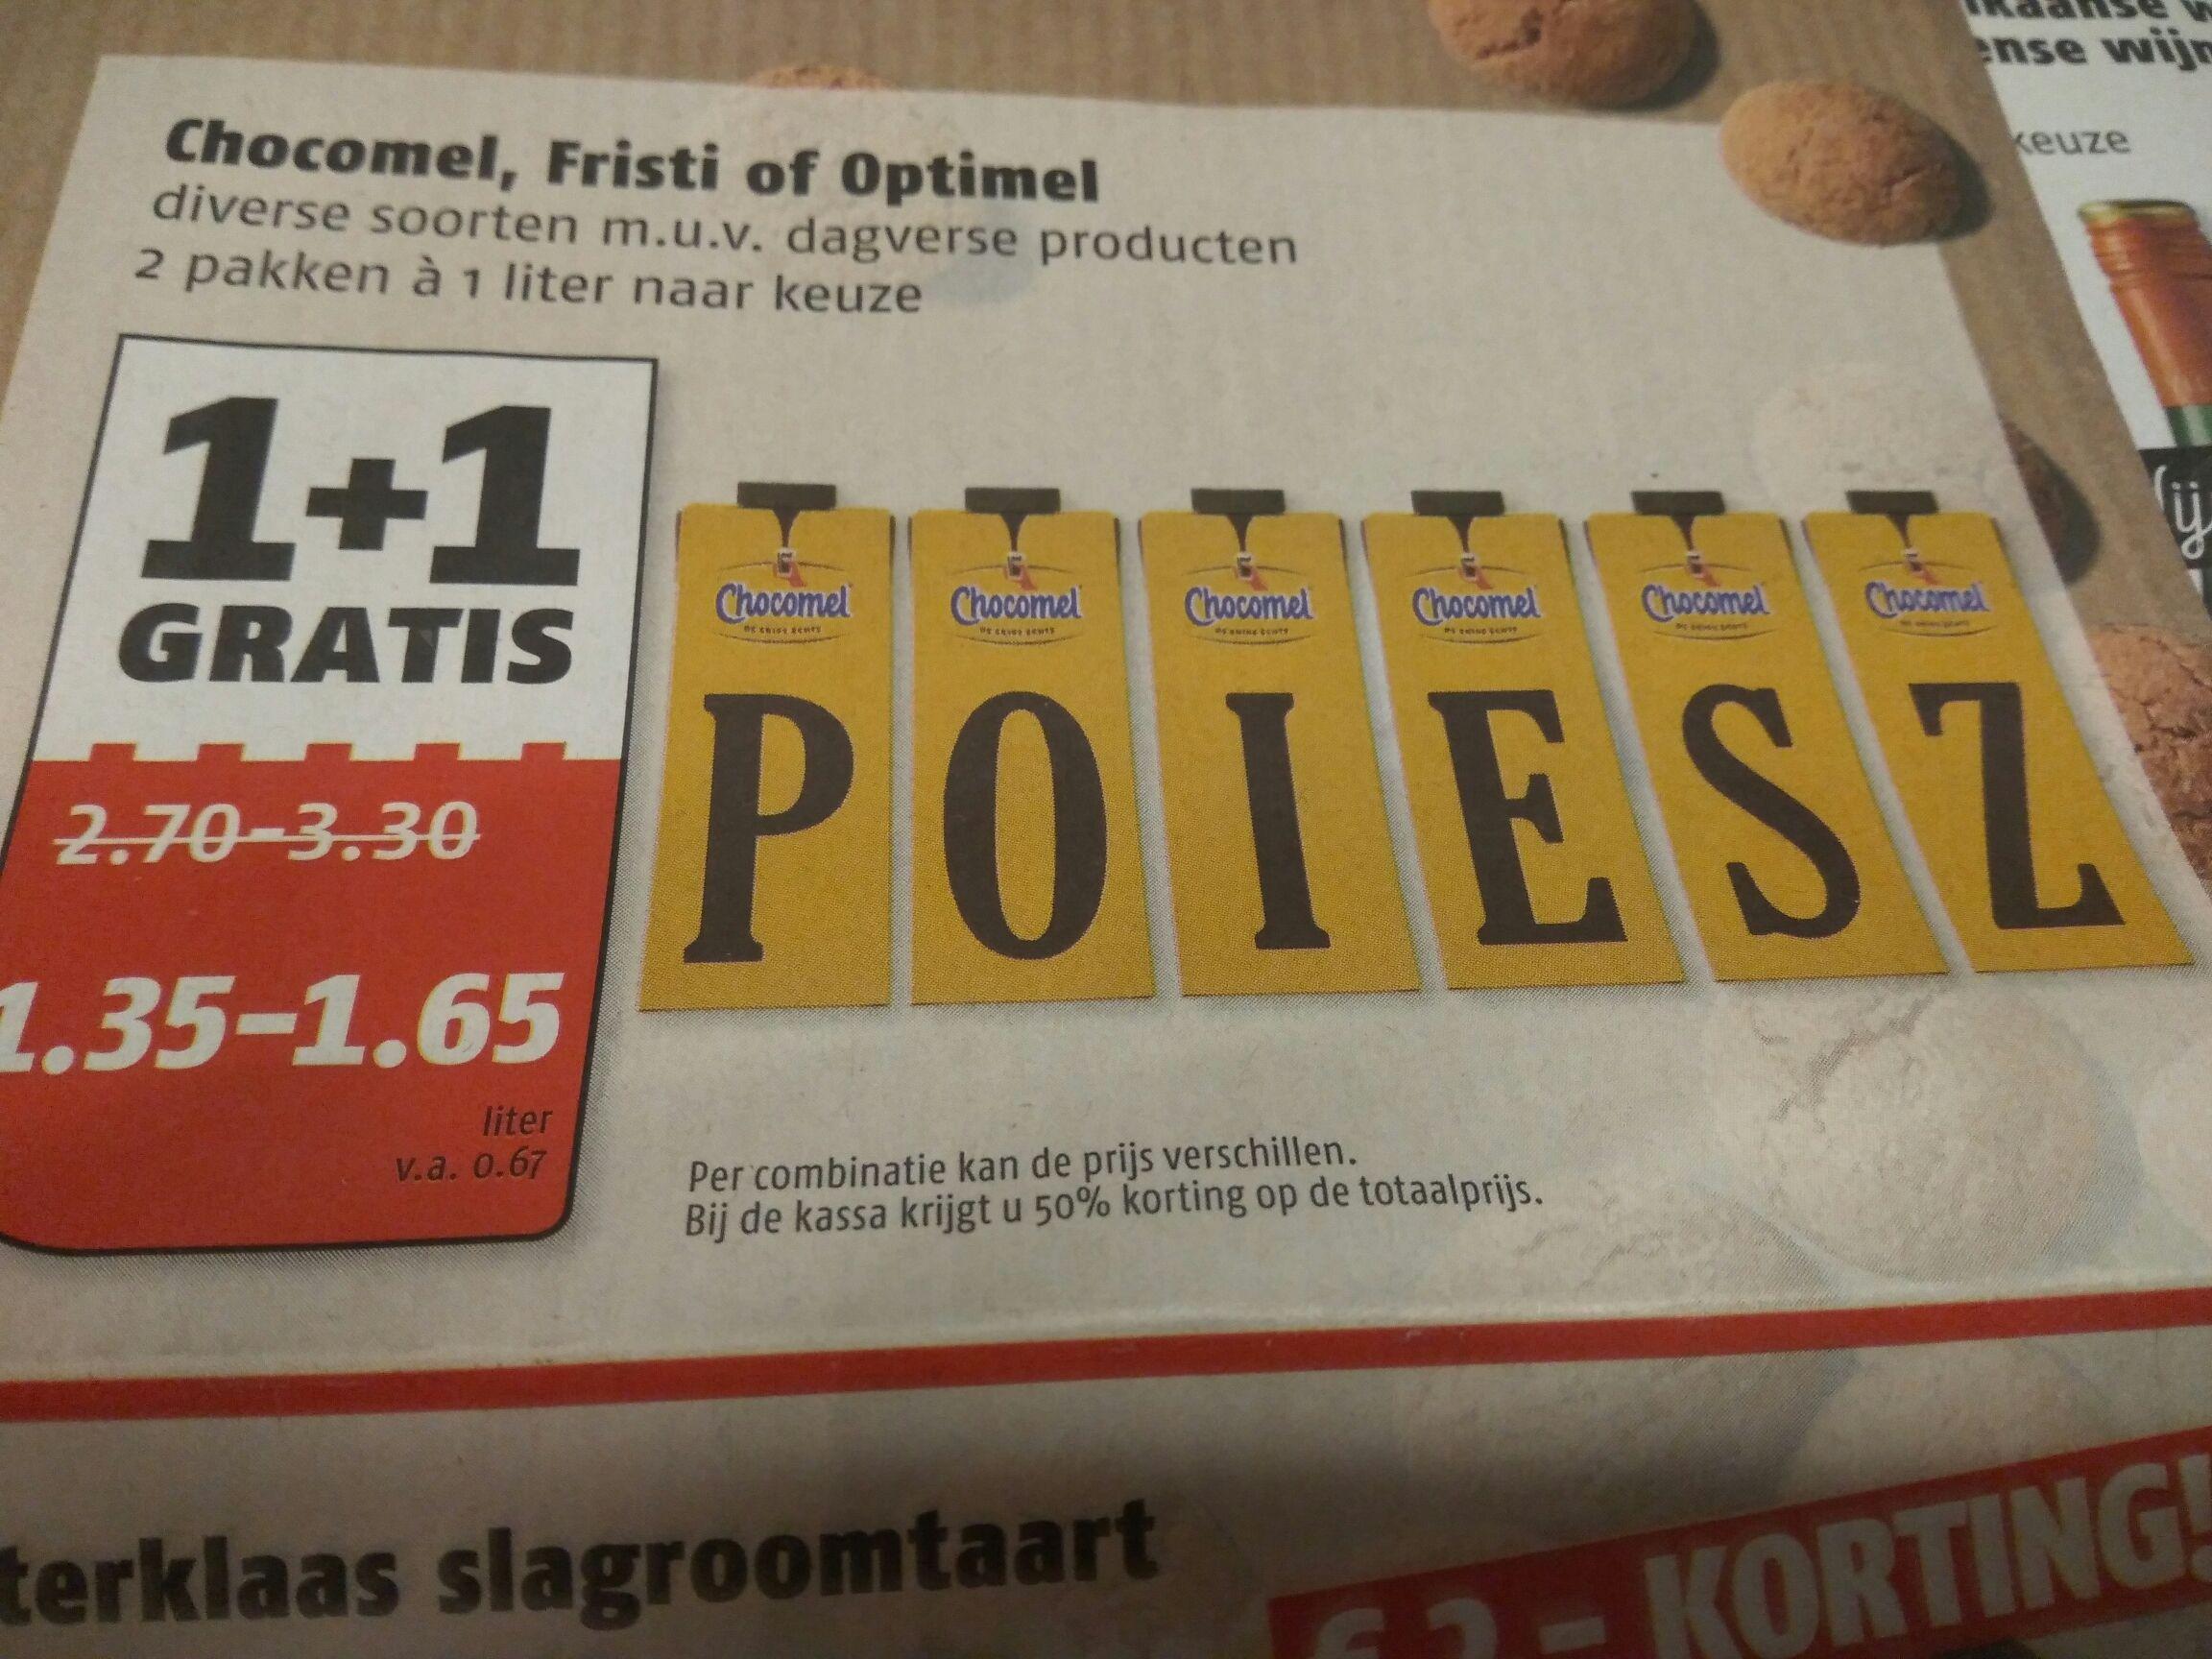 Chocomel, Fristi en Optimel 1+1 gratis @Poiesz